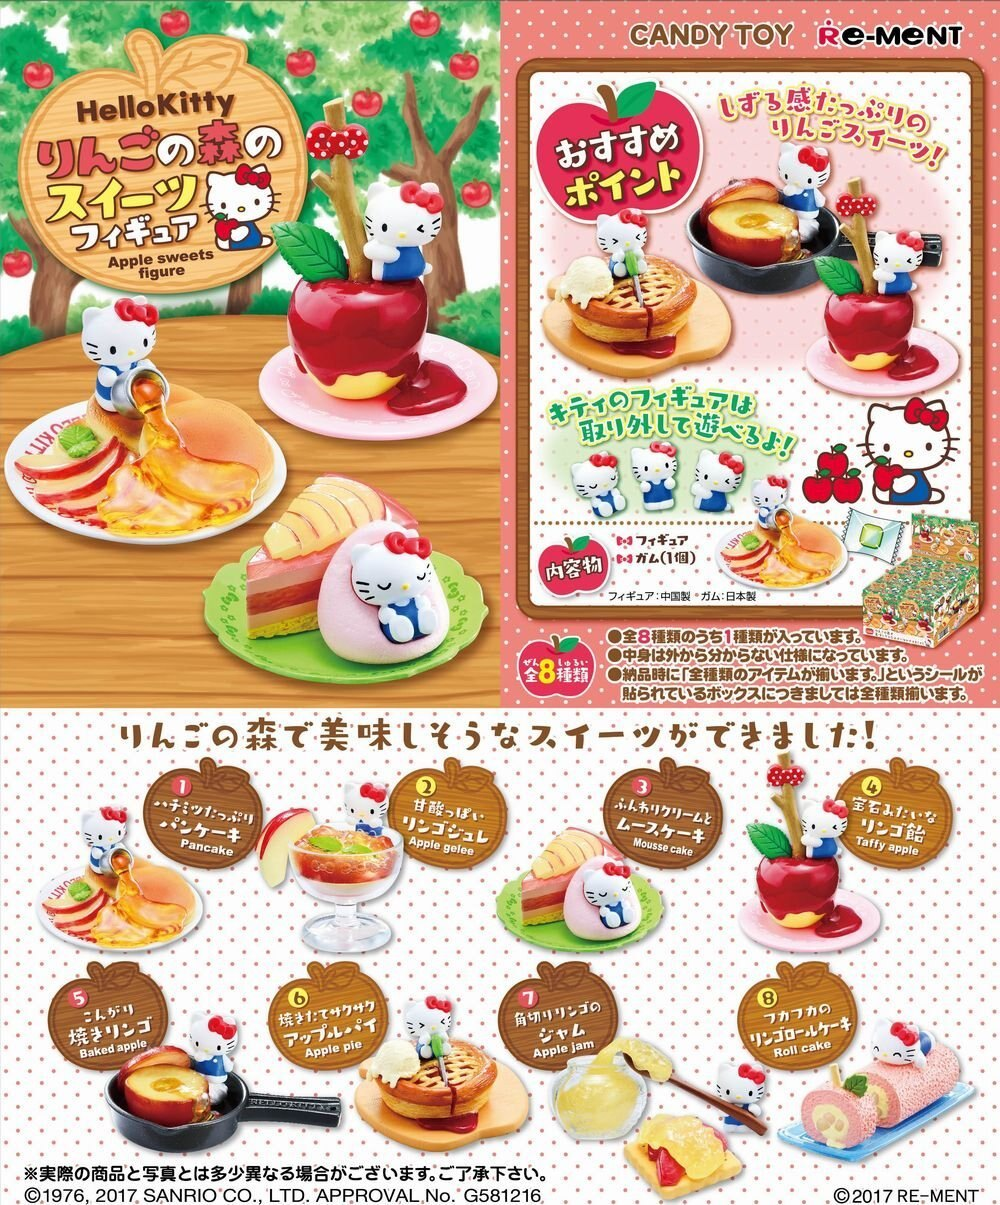 X射線【C151960】Hello Kitty 蘋果甜點食玩-8款造型隨機出貨,扭蛋/杯緣子/公仔/盒玩/食玩